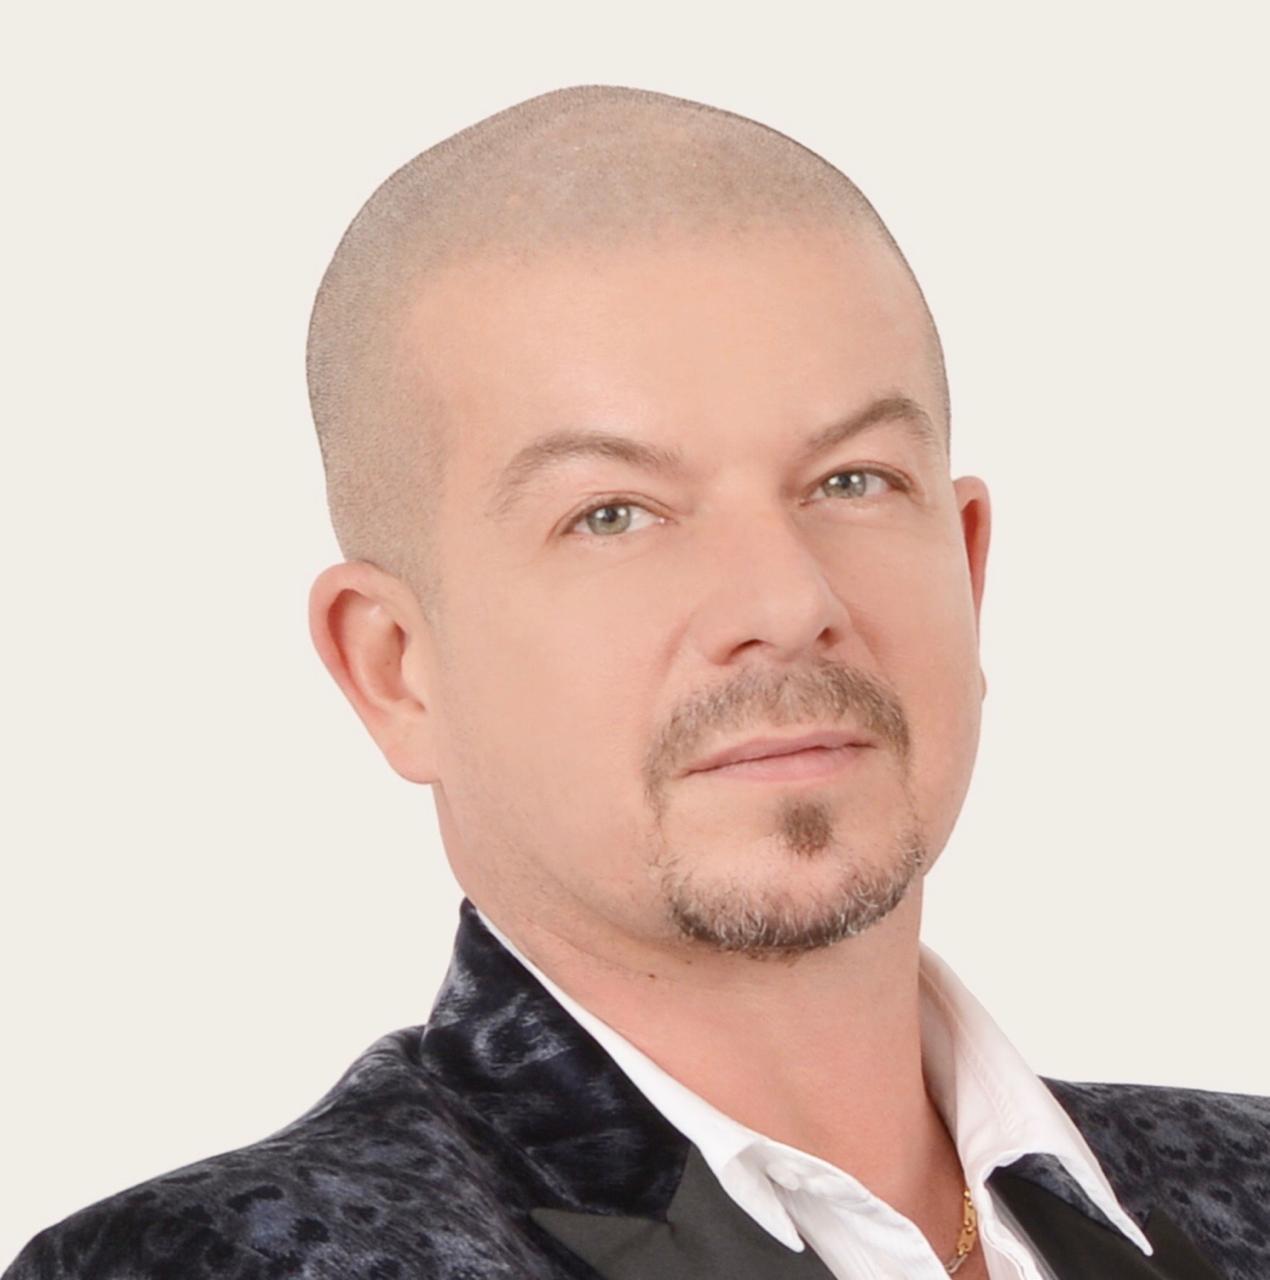 Blaise Carroz, Senior Advisor, Global Acquisitions at Idoneus